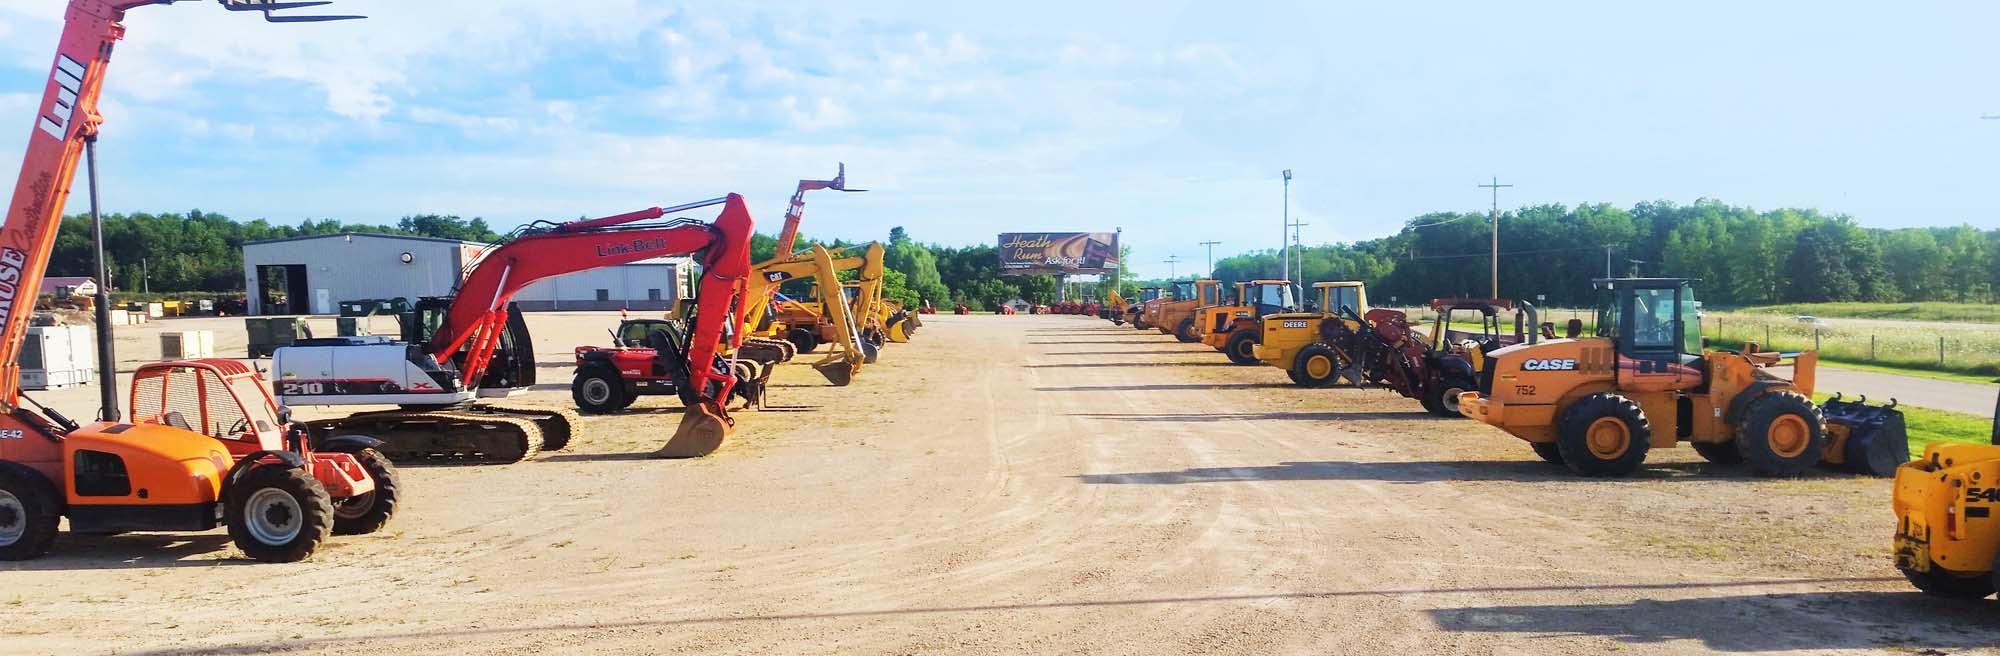 Homepage | D&B Construction Equipment